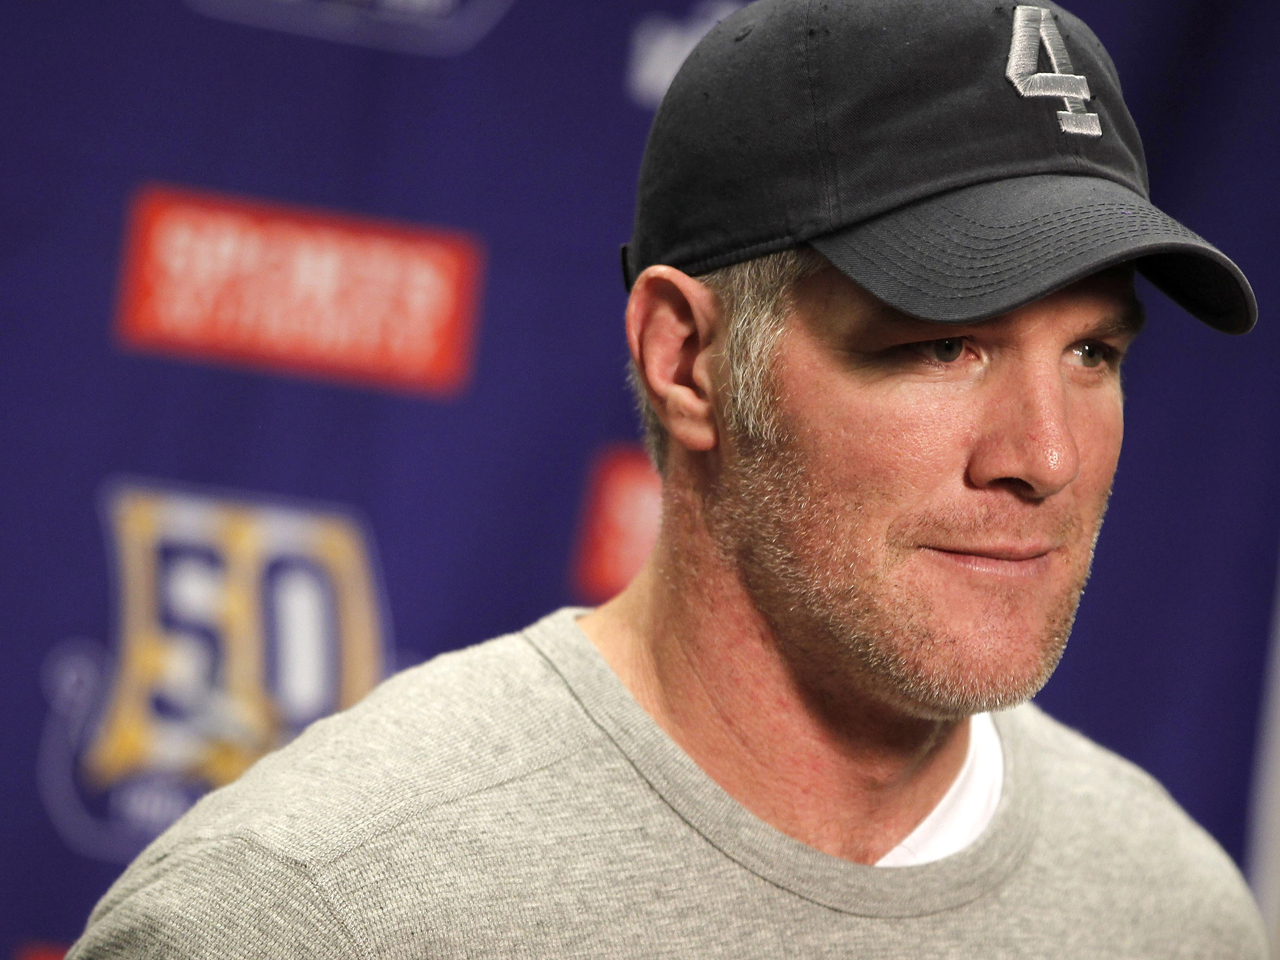 brett favre admits serious memory loss in radio interview cbs news